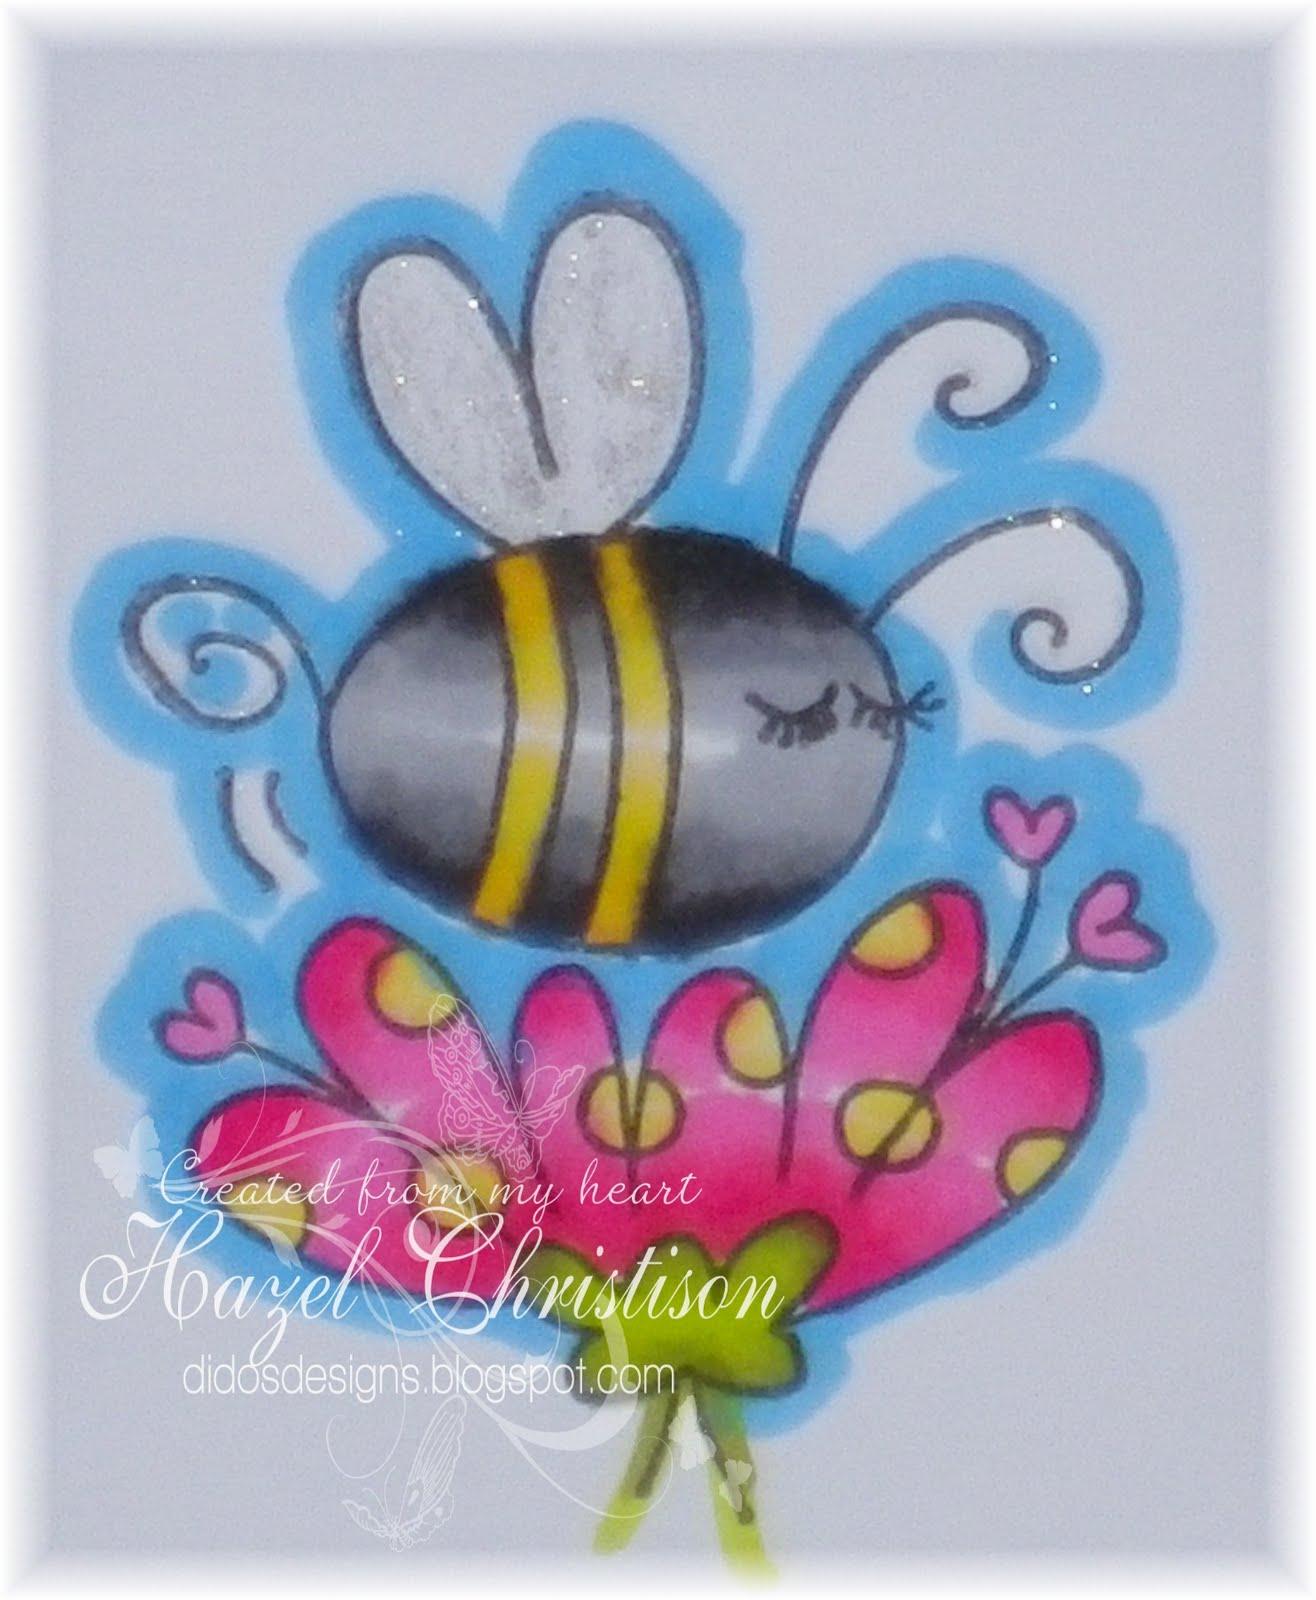 http://3.bp.blogspot.com/-h4tdXqm4FcY/TfHTlfs6ZNI/AAAAAAAAFSE/q5rdvIMmgPs/s1600/Cards+By+Dido%2527s+Designs+004.JPG